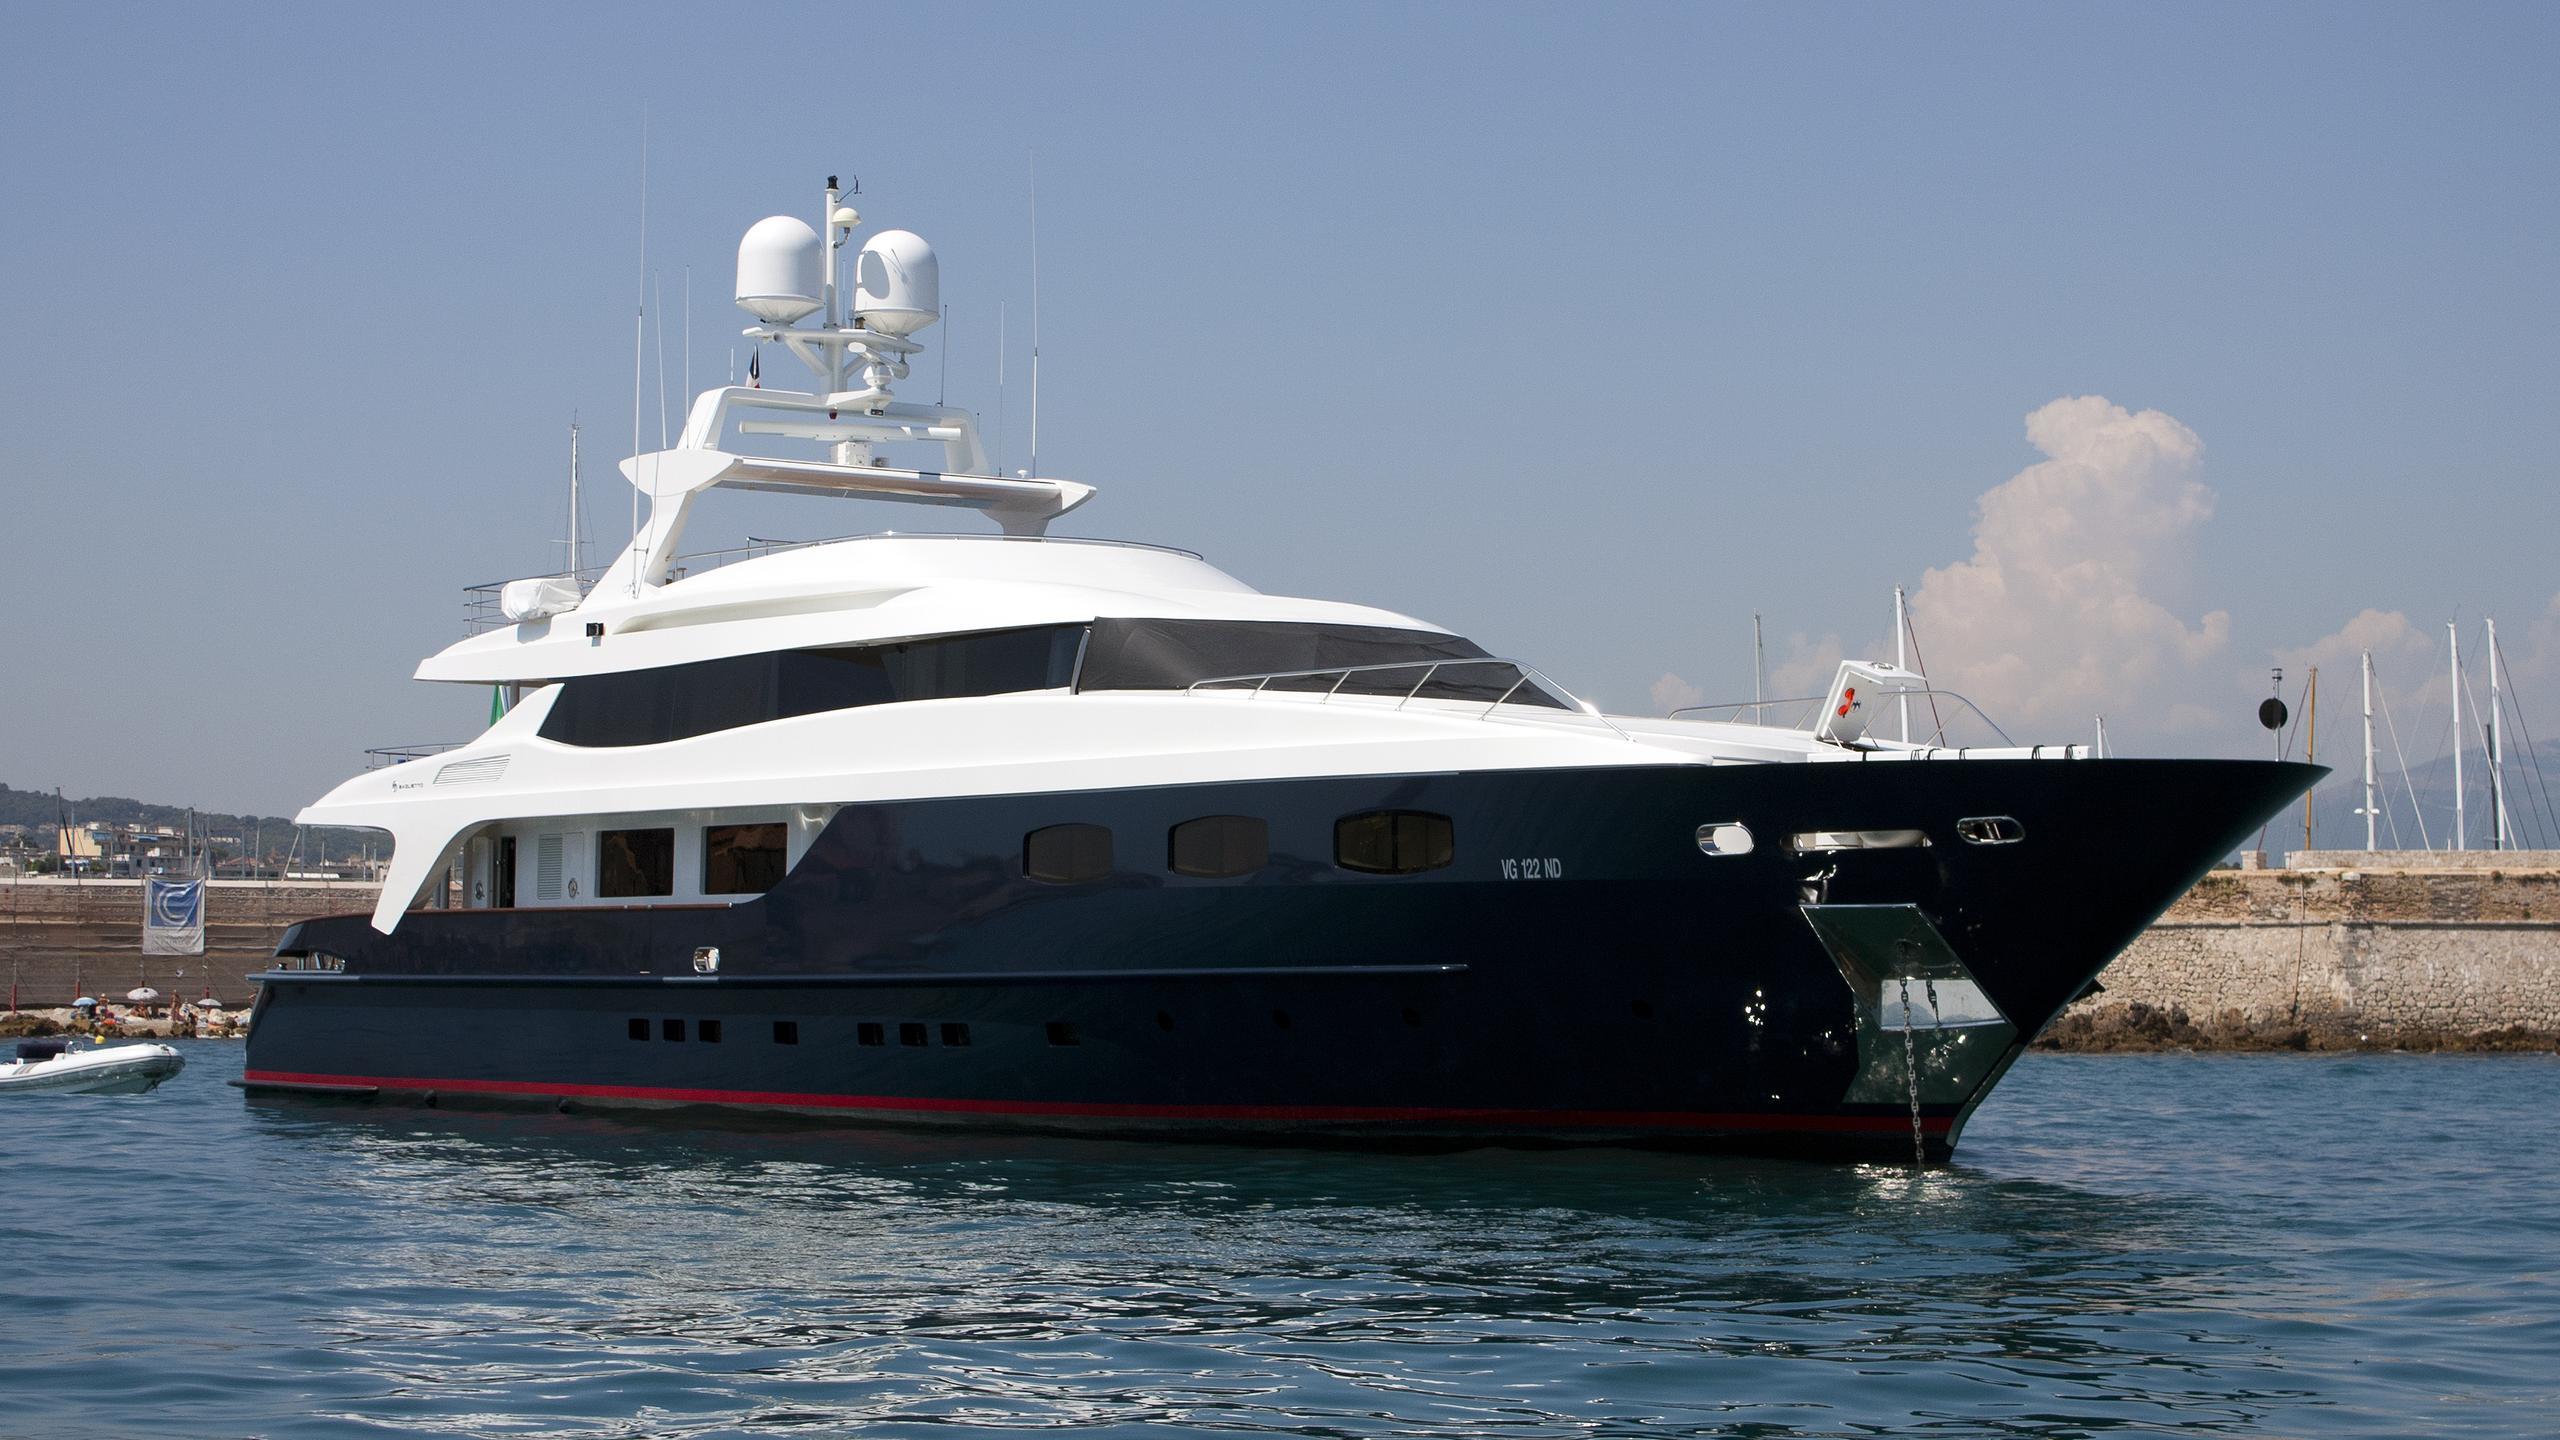 blue-scorpion-motoryacht-baglietto-2003-42m-bow-view